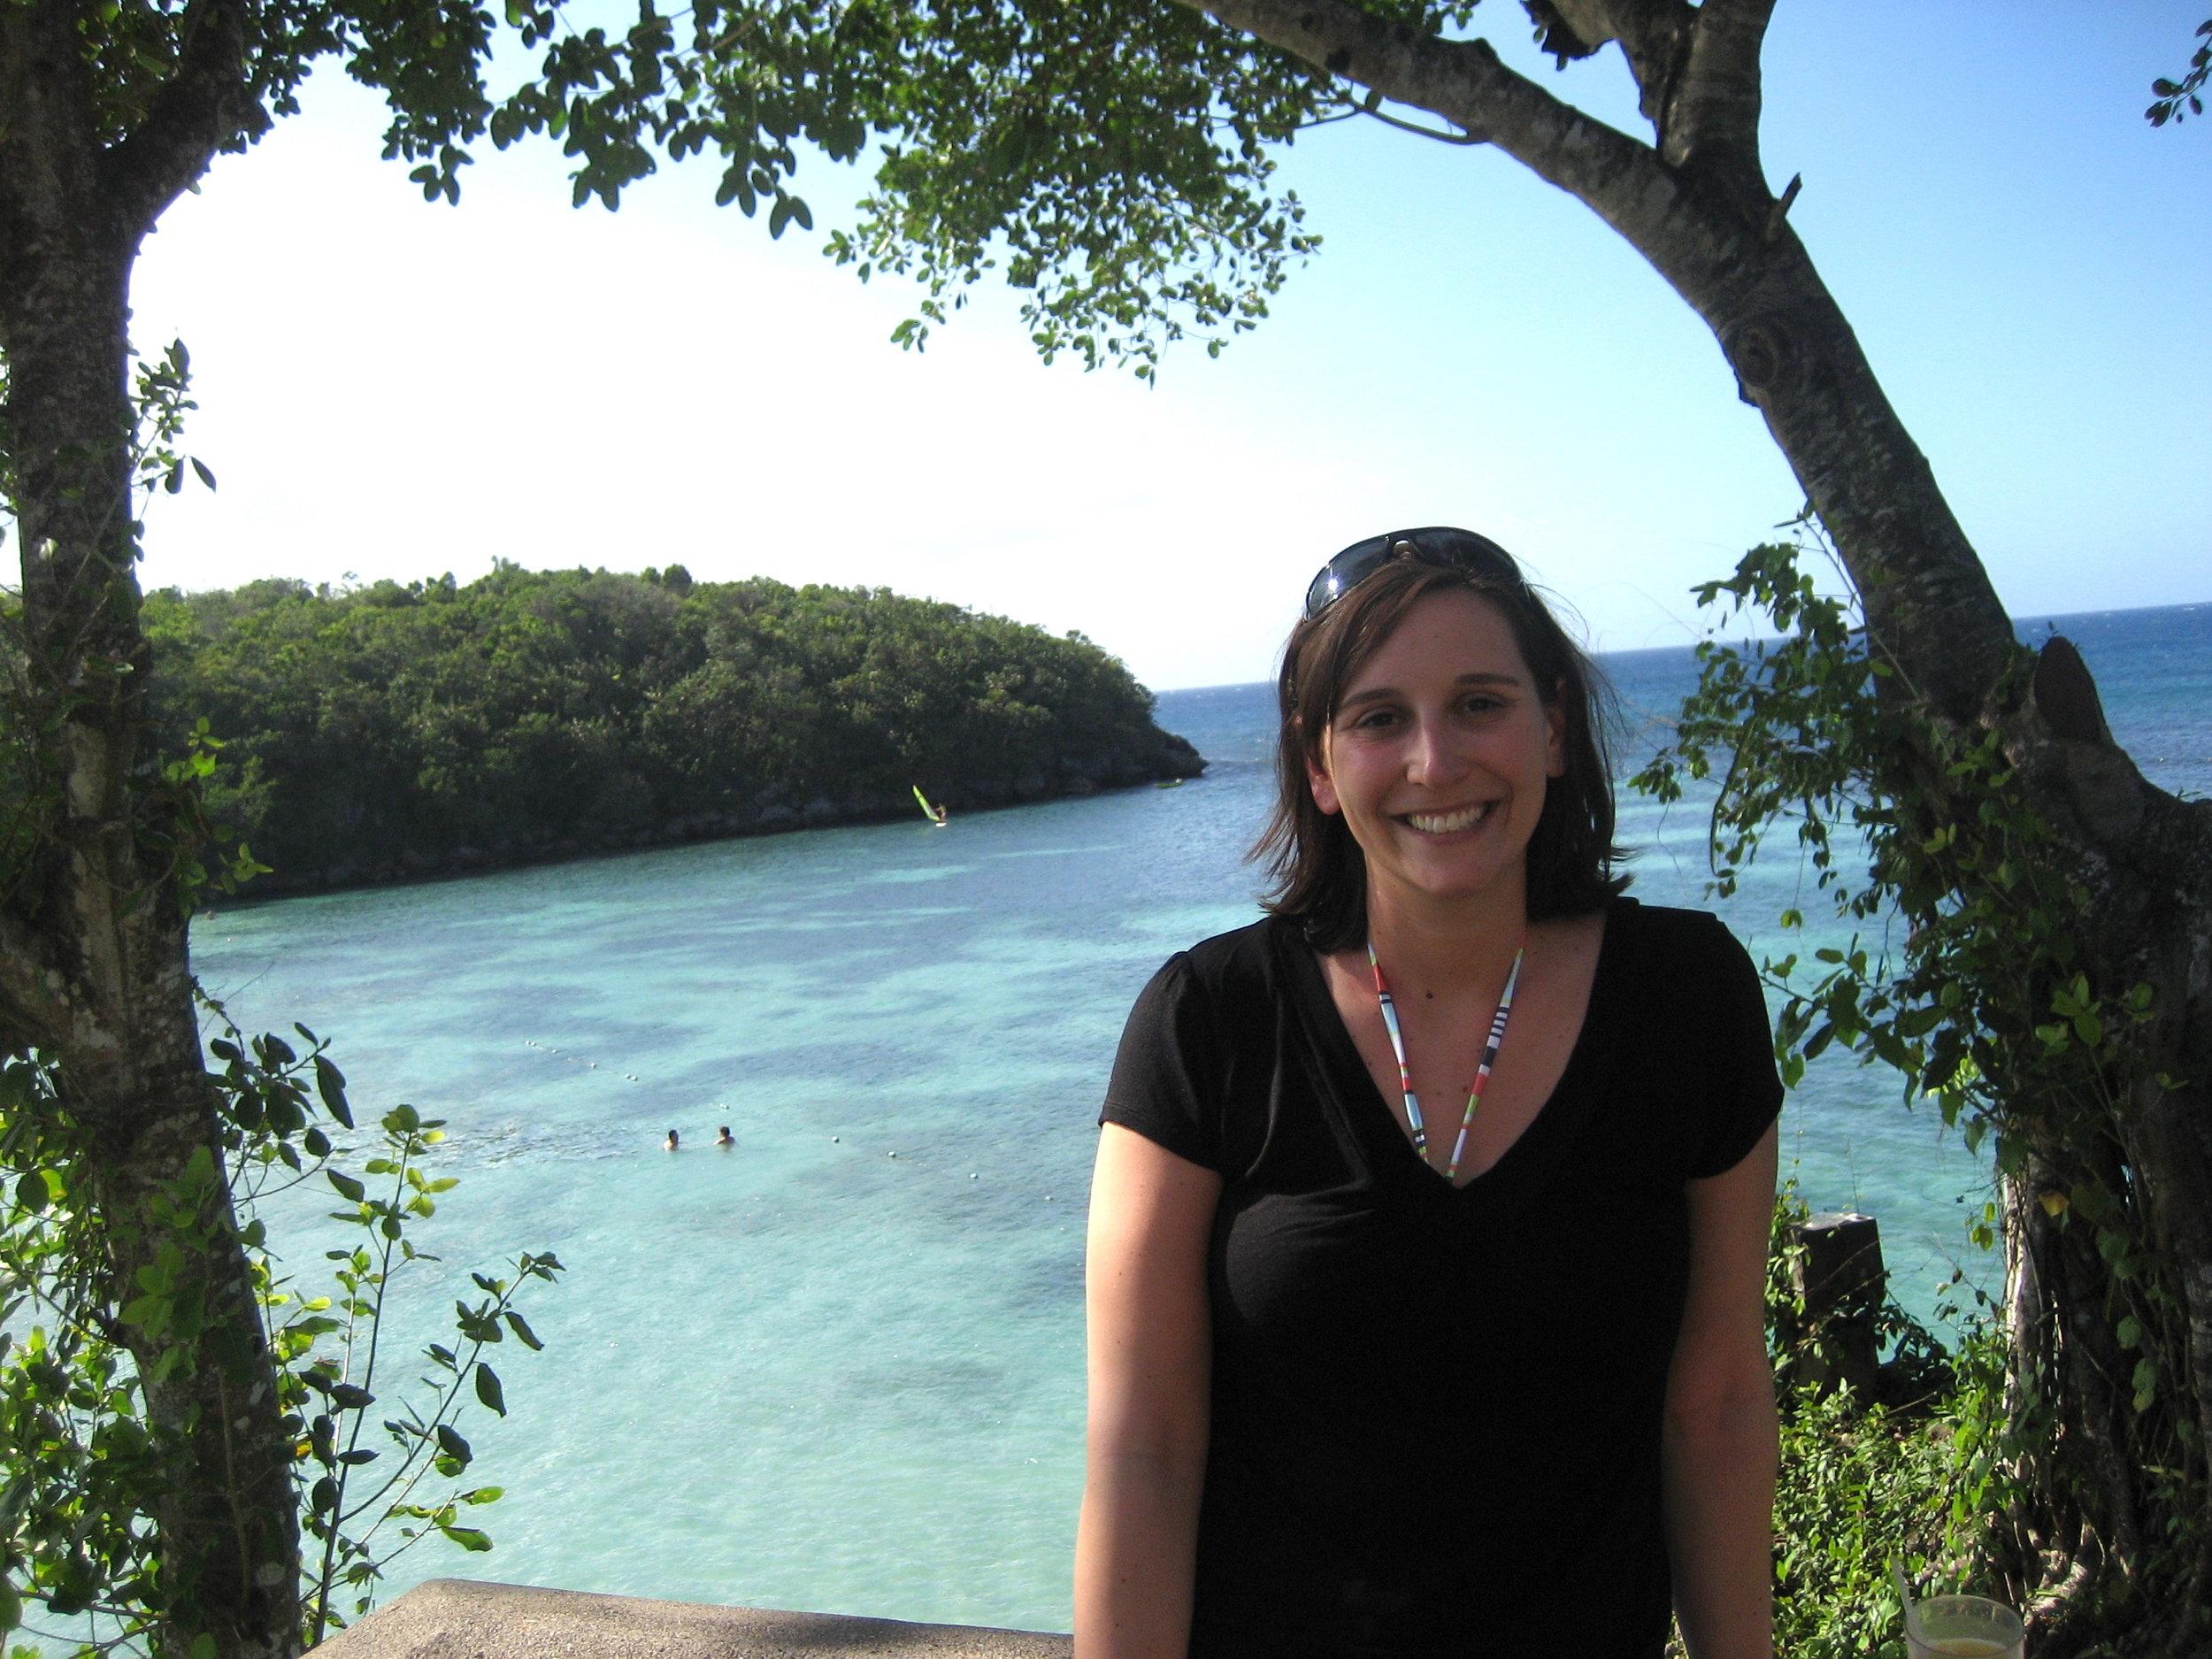 Seaside in Jamaica in 2008